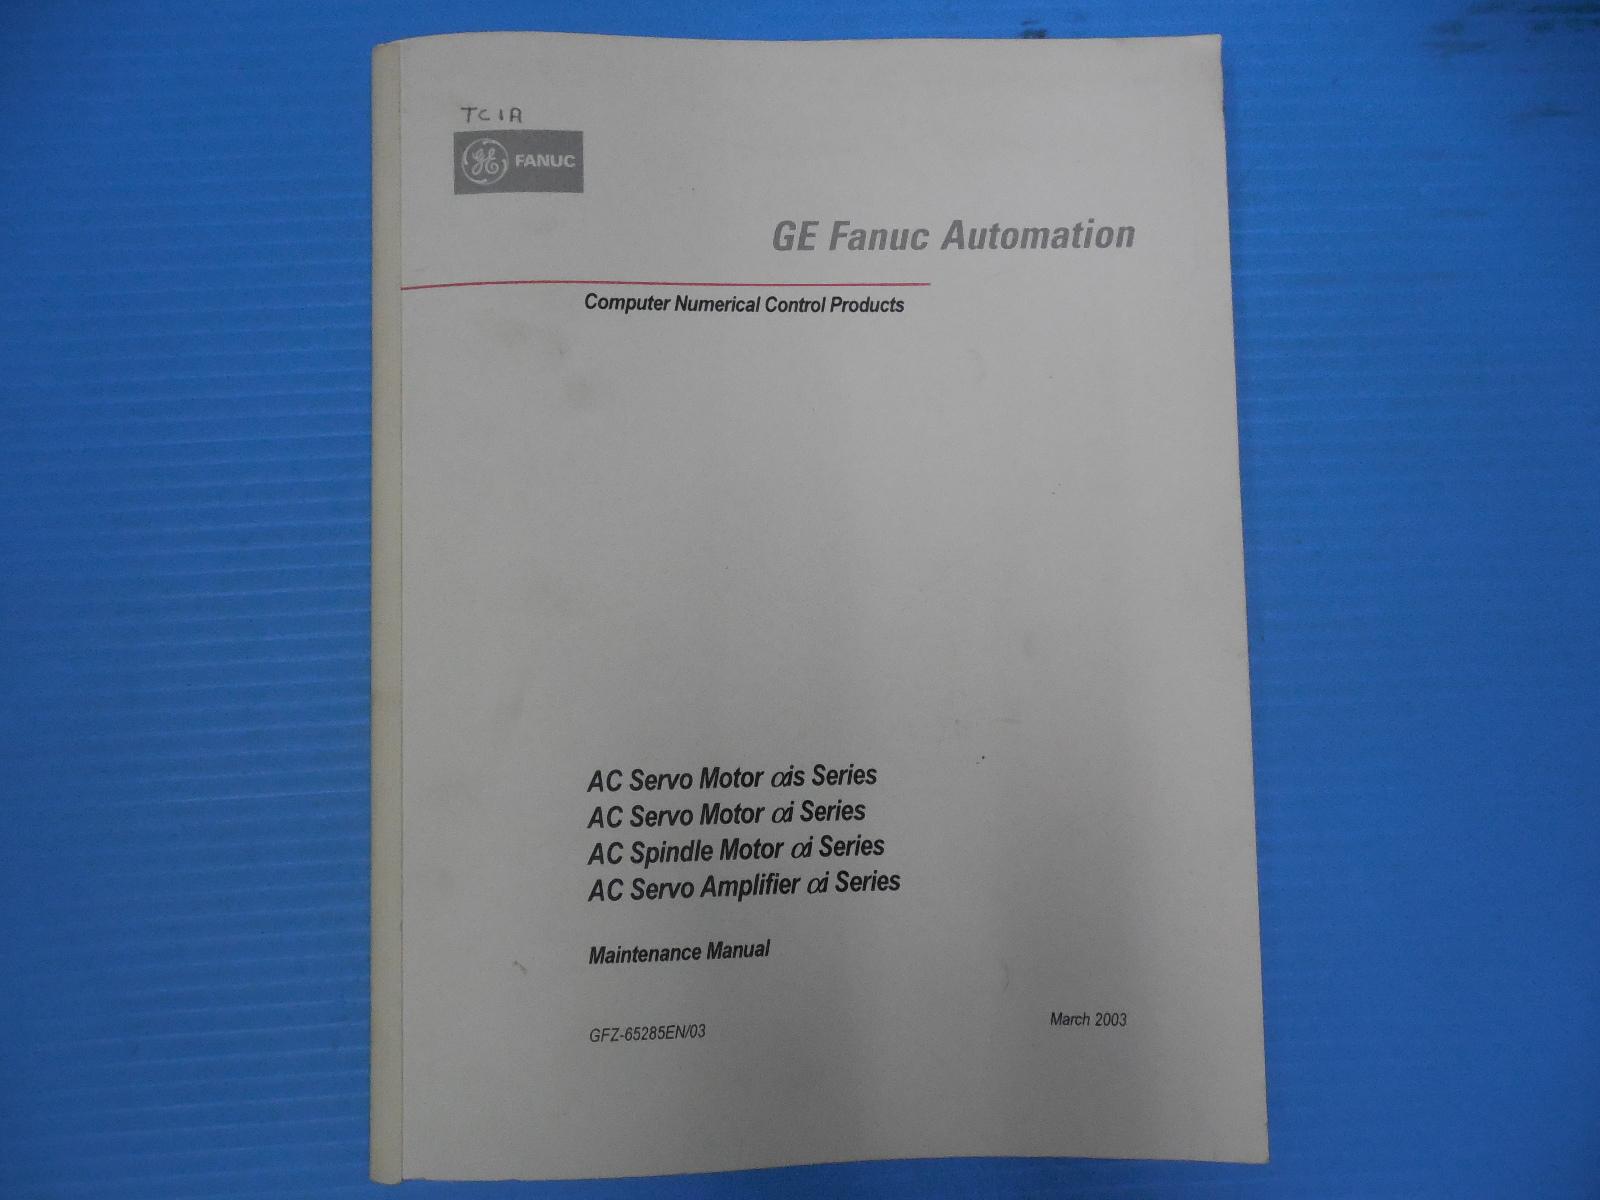 Hatz E780 Manual Ebook Mitsubishi Pajero 5 800 00 Modello Km 250 000 Anno 1997 11 1 Array Wilmar Spreader Rh Spirulinas De